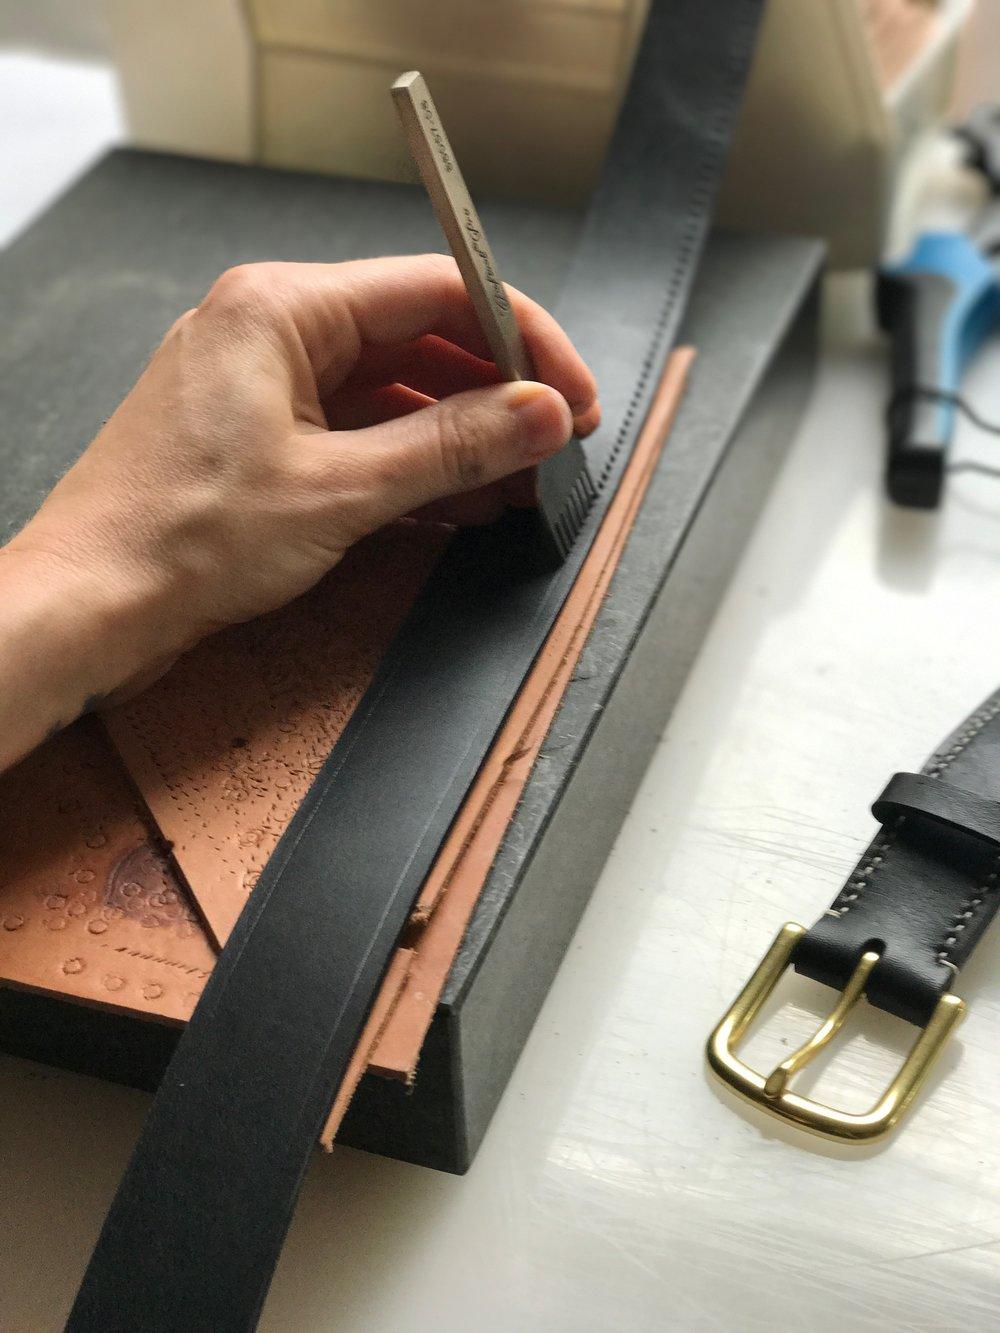 mary-savel-studio-leather-work7.jpeg